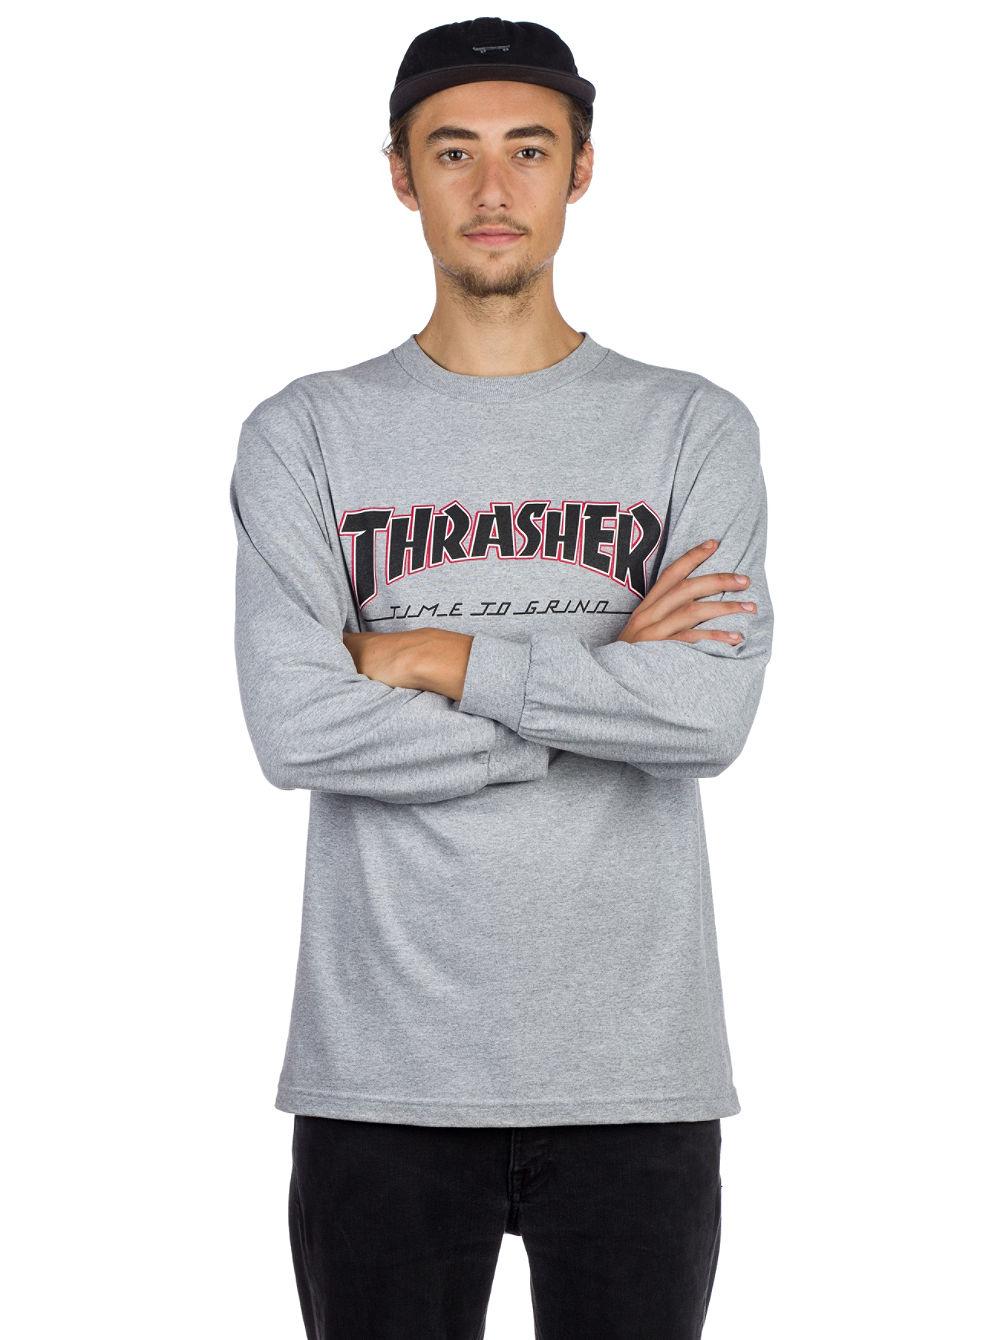 dbbf70d1 Buy Independent X Thrasher Ttg Long Sleeve T-Shirt online at Blue Tomato